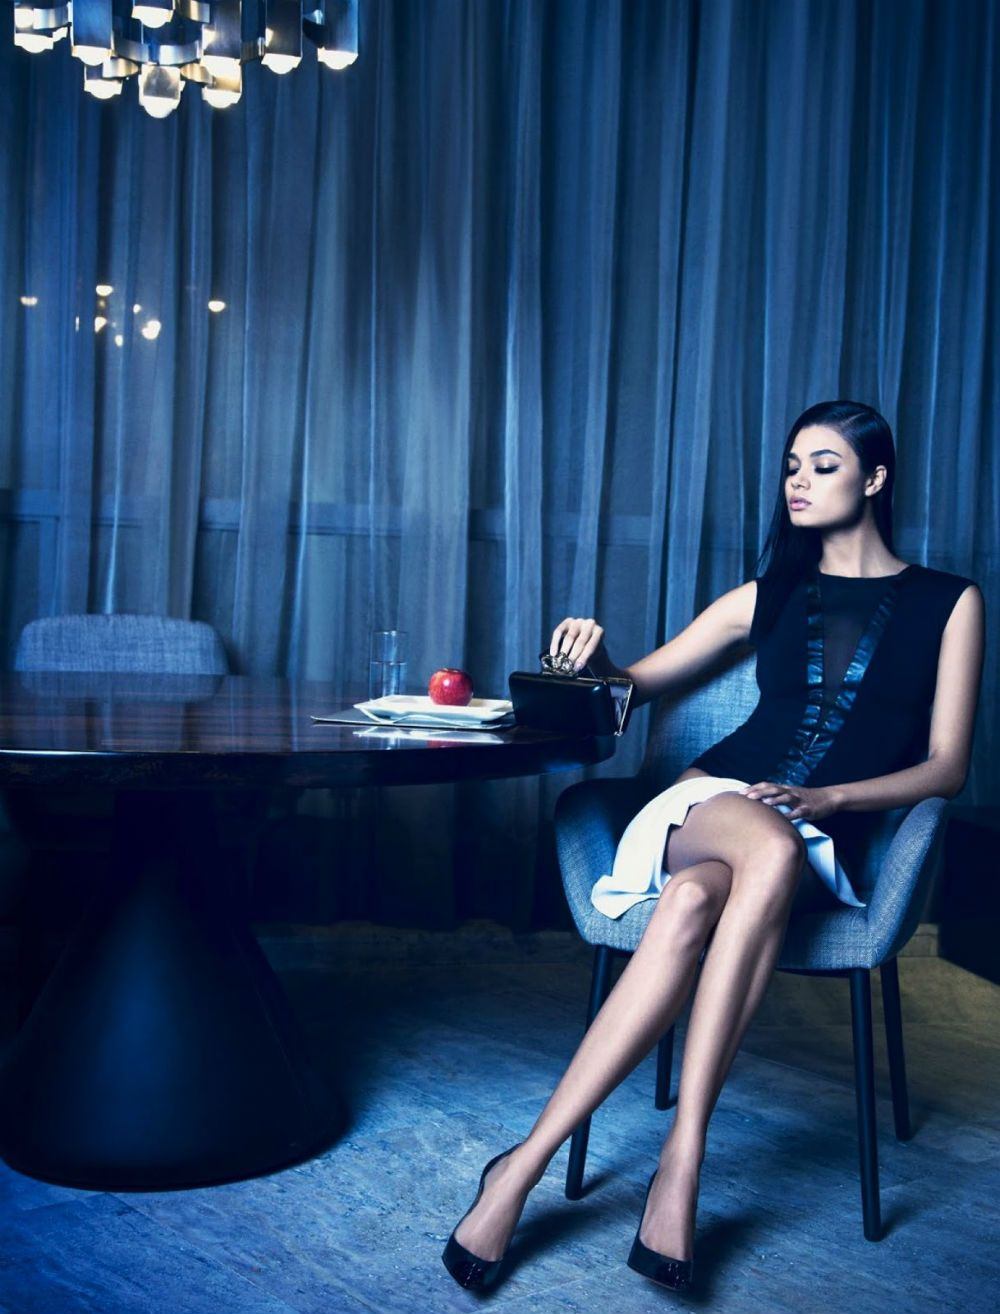 Model Daniela Braga, photographer Yossi Michaeli for Harpers Bazaar, Brazil, August 2013